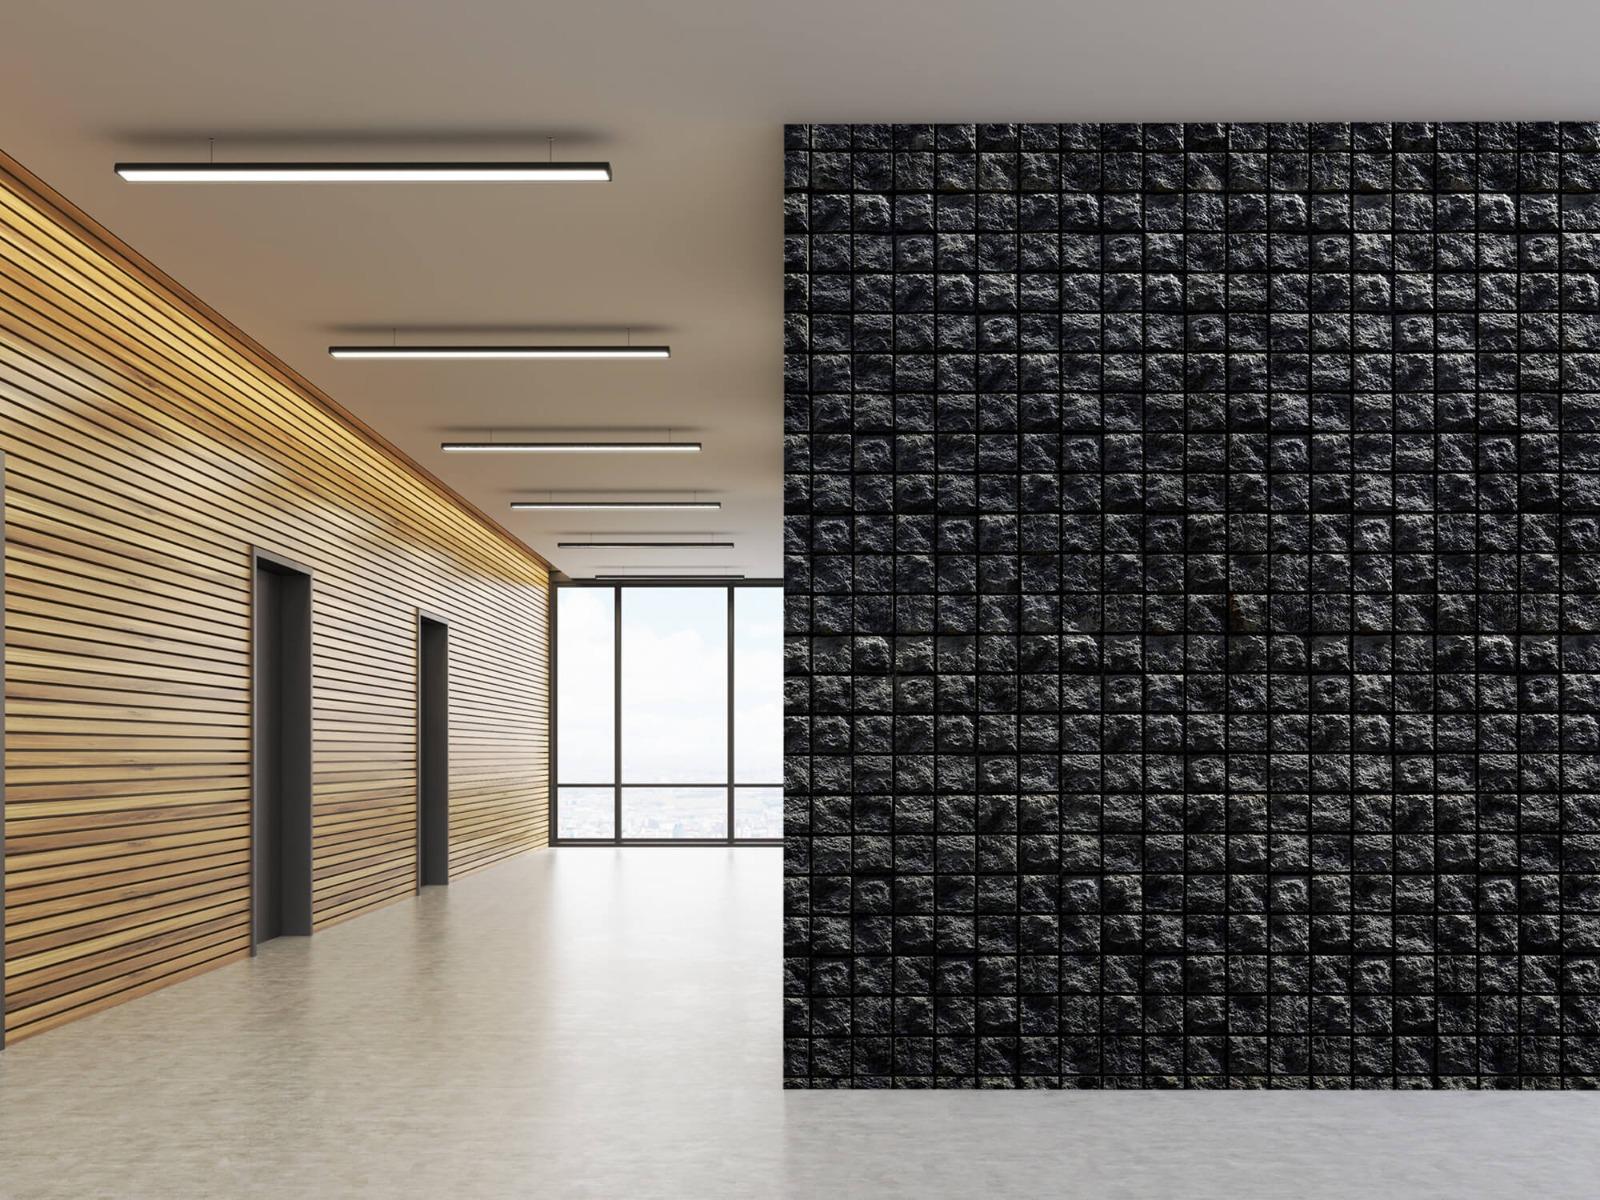 Tegel behang - Vierkante zwarte stenen - Wallexclusive - Woonkamer 5